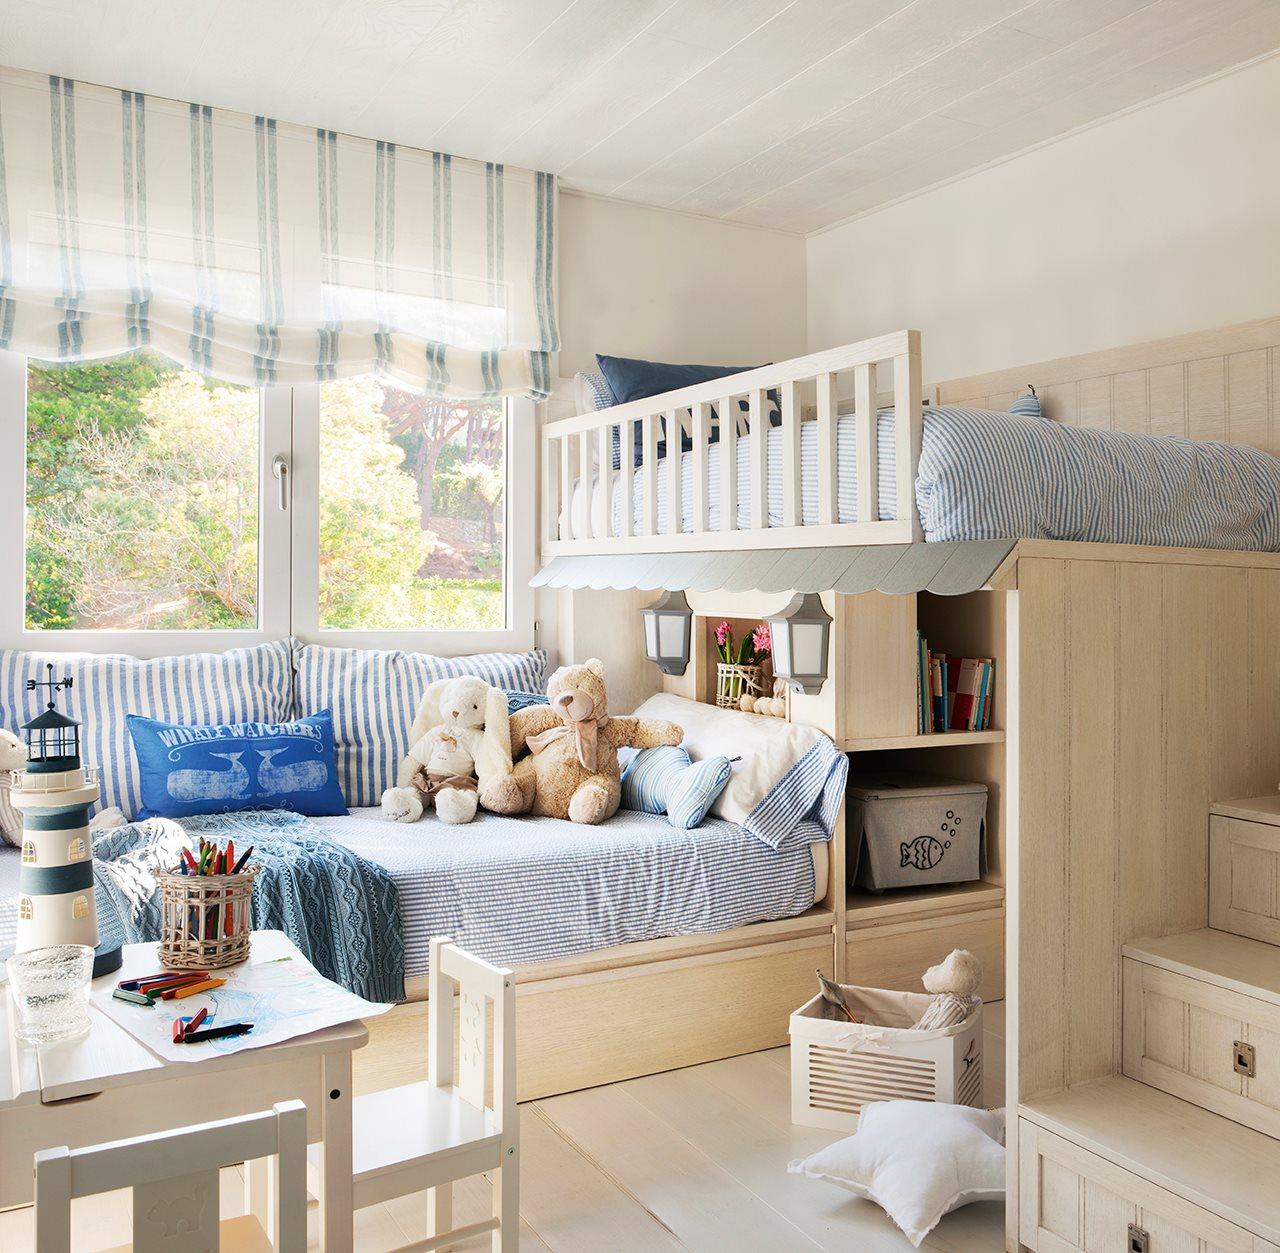 http://www.elmueble.com/medio/2016/04/13/dormitorio_de_ninos_con_dos_camas_en_tonos_azules_1280x1253.jpg